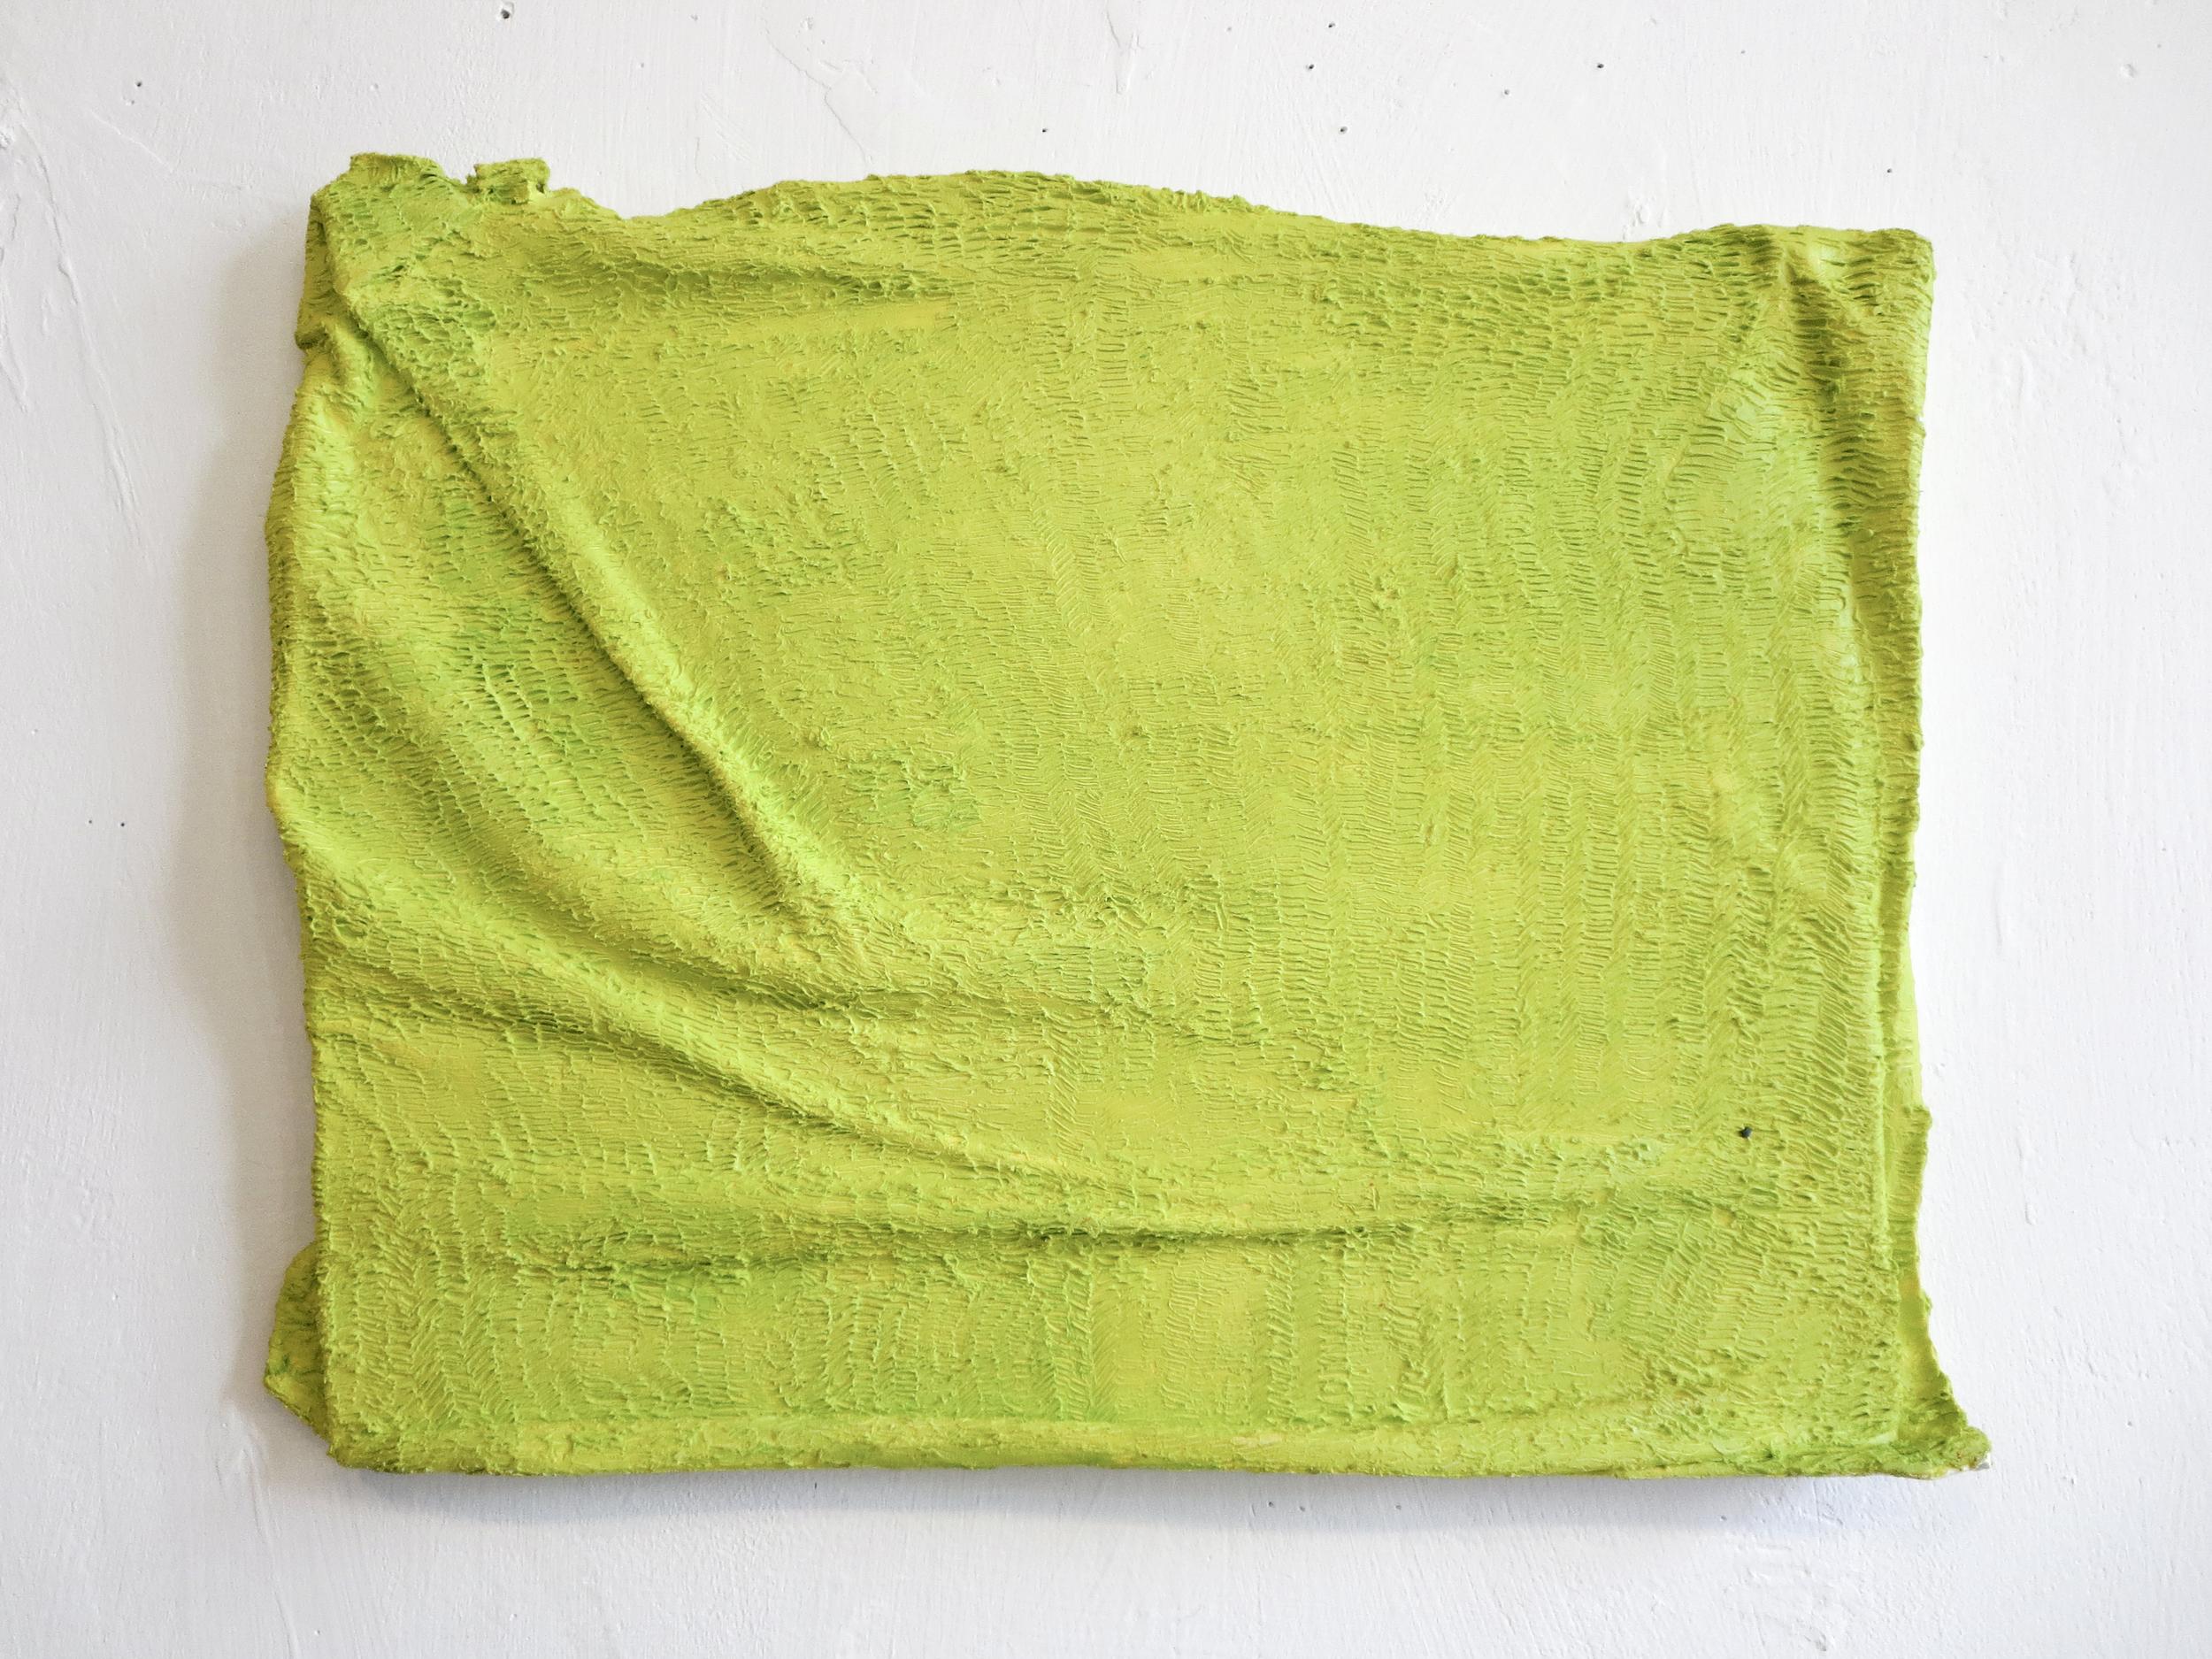 YellowCloth(1).jpg